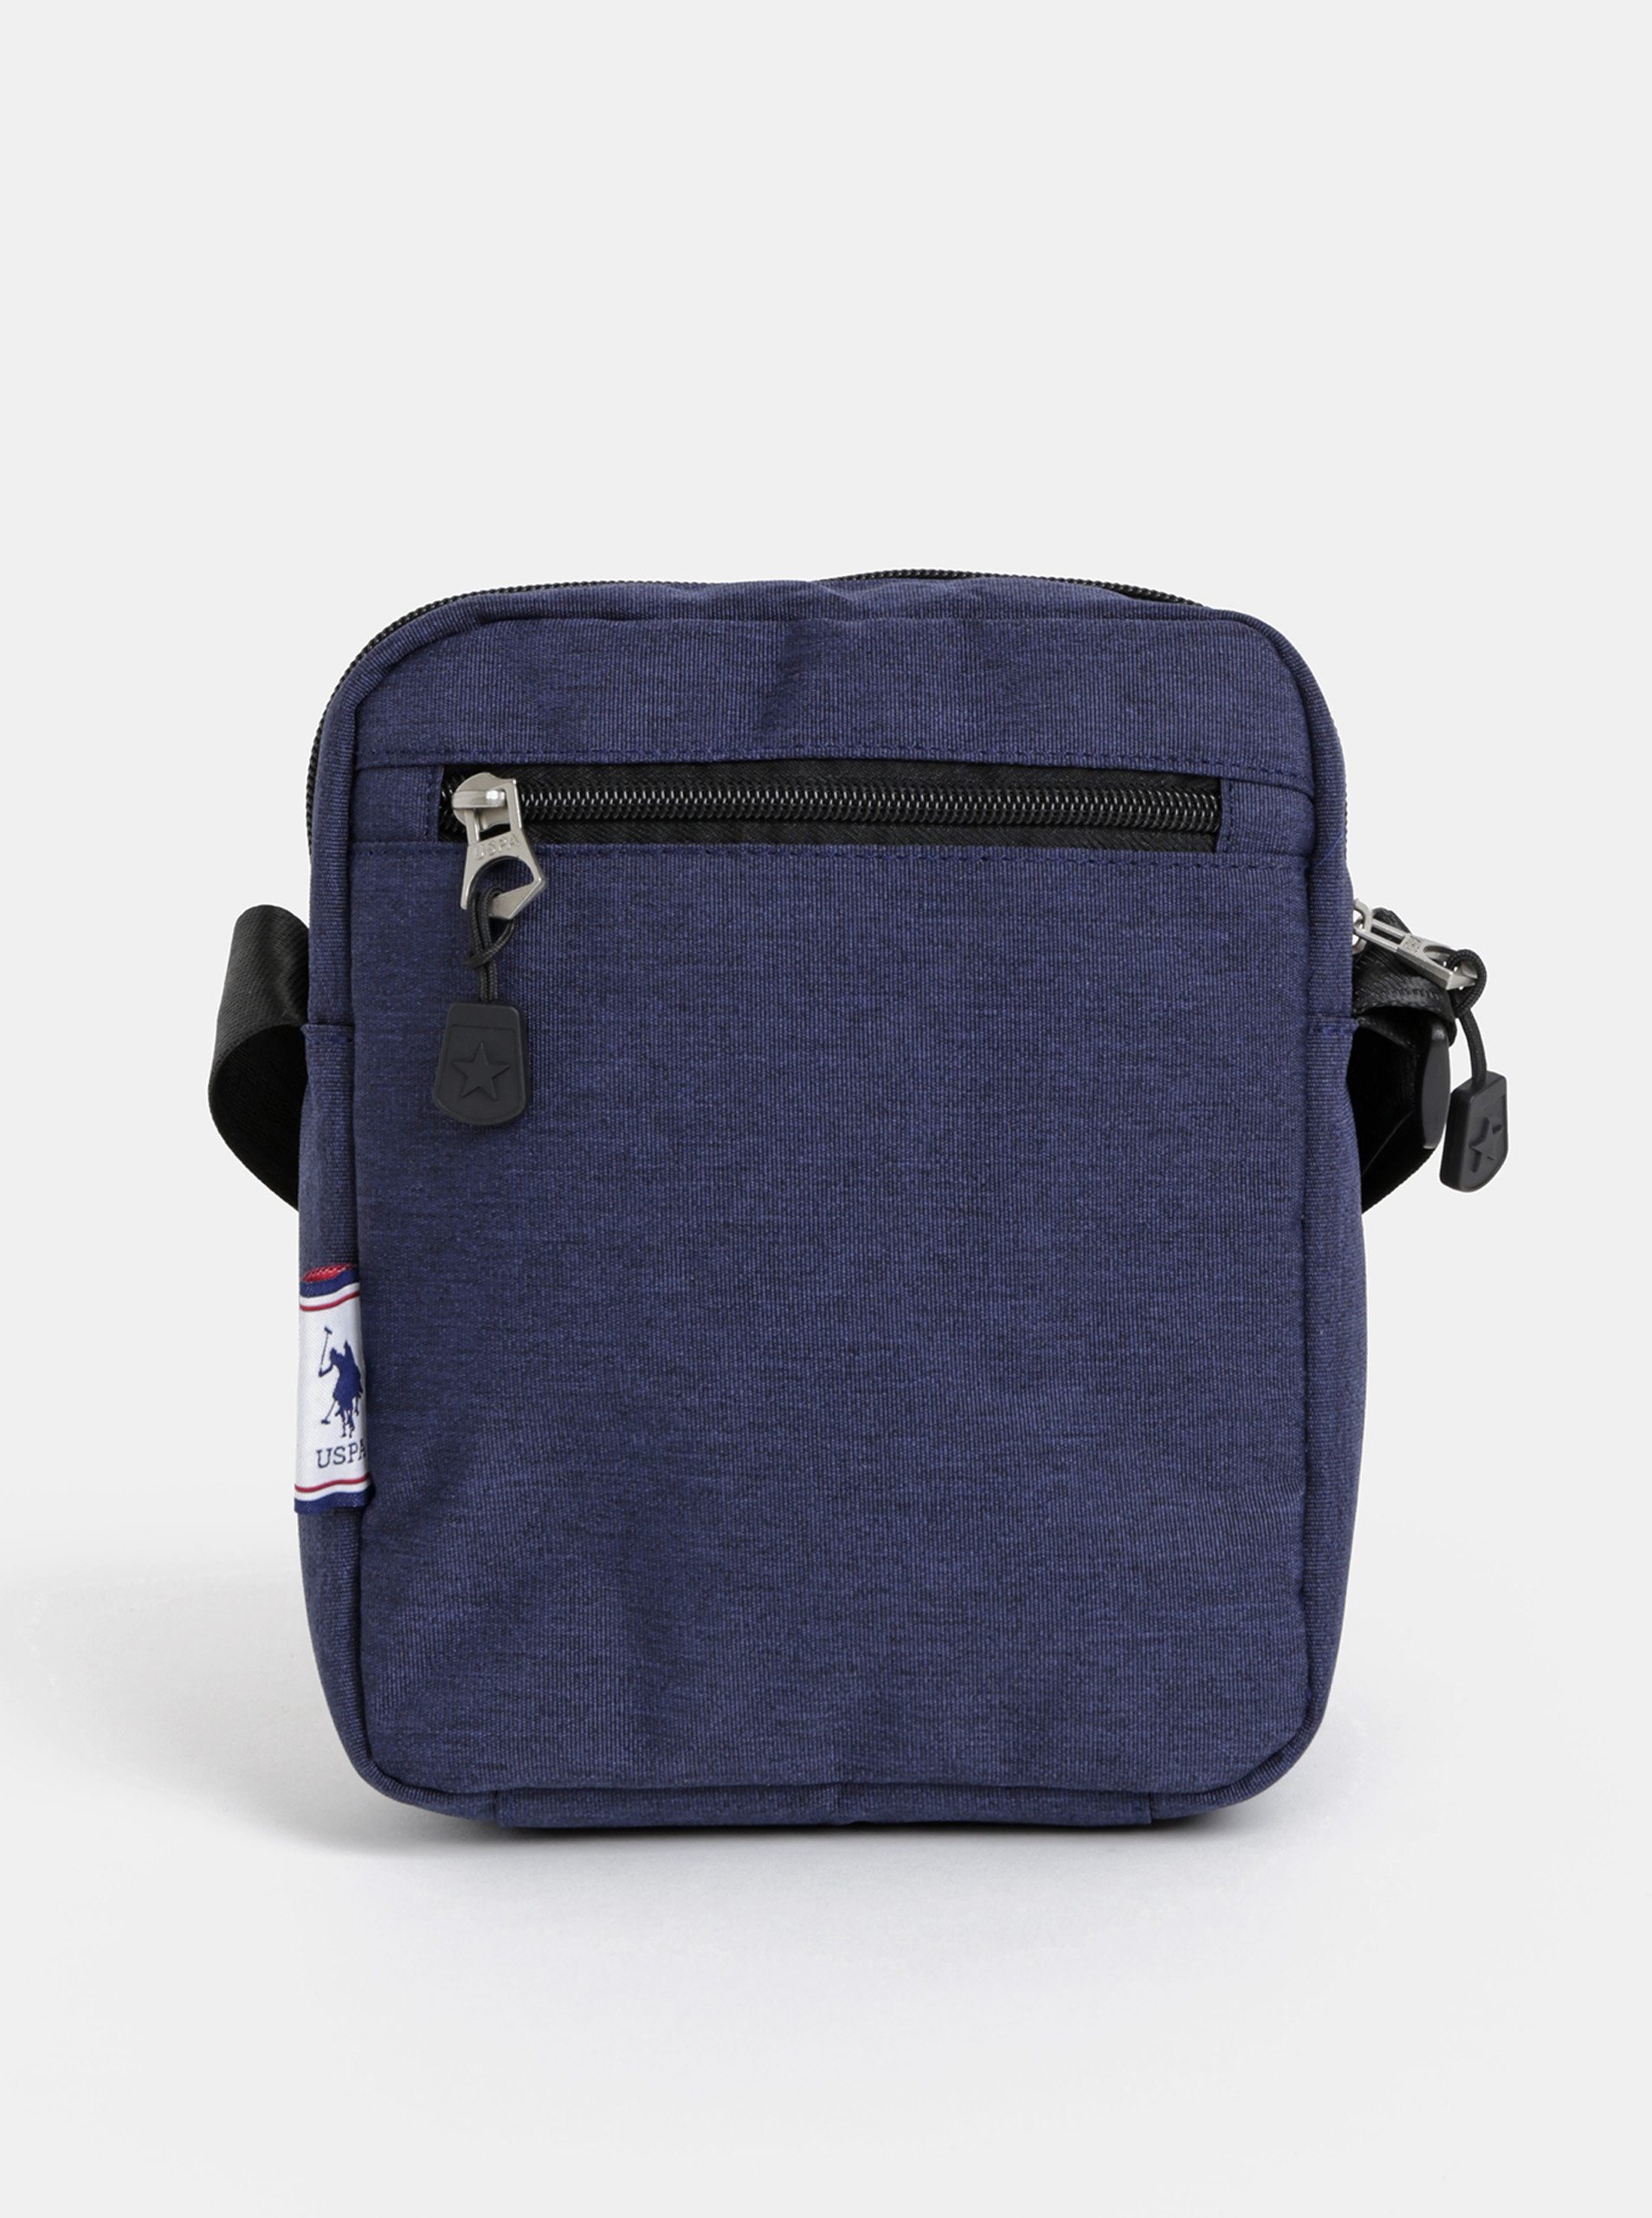 65b4e9d17e Tmavě modrá pánská crossbody taška U.S. Polo Assn. ...